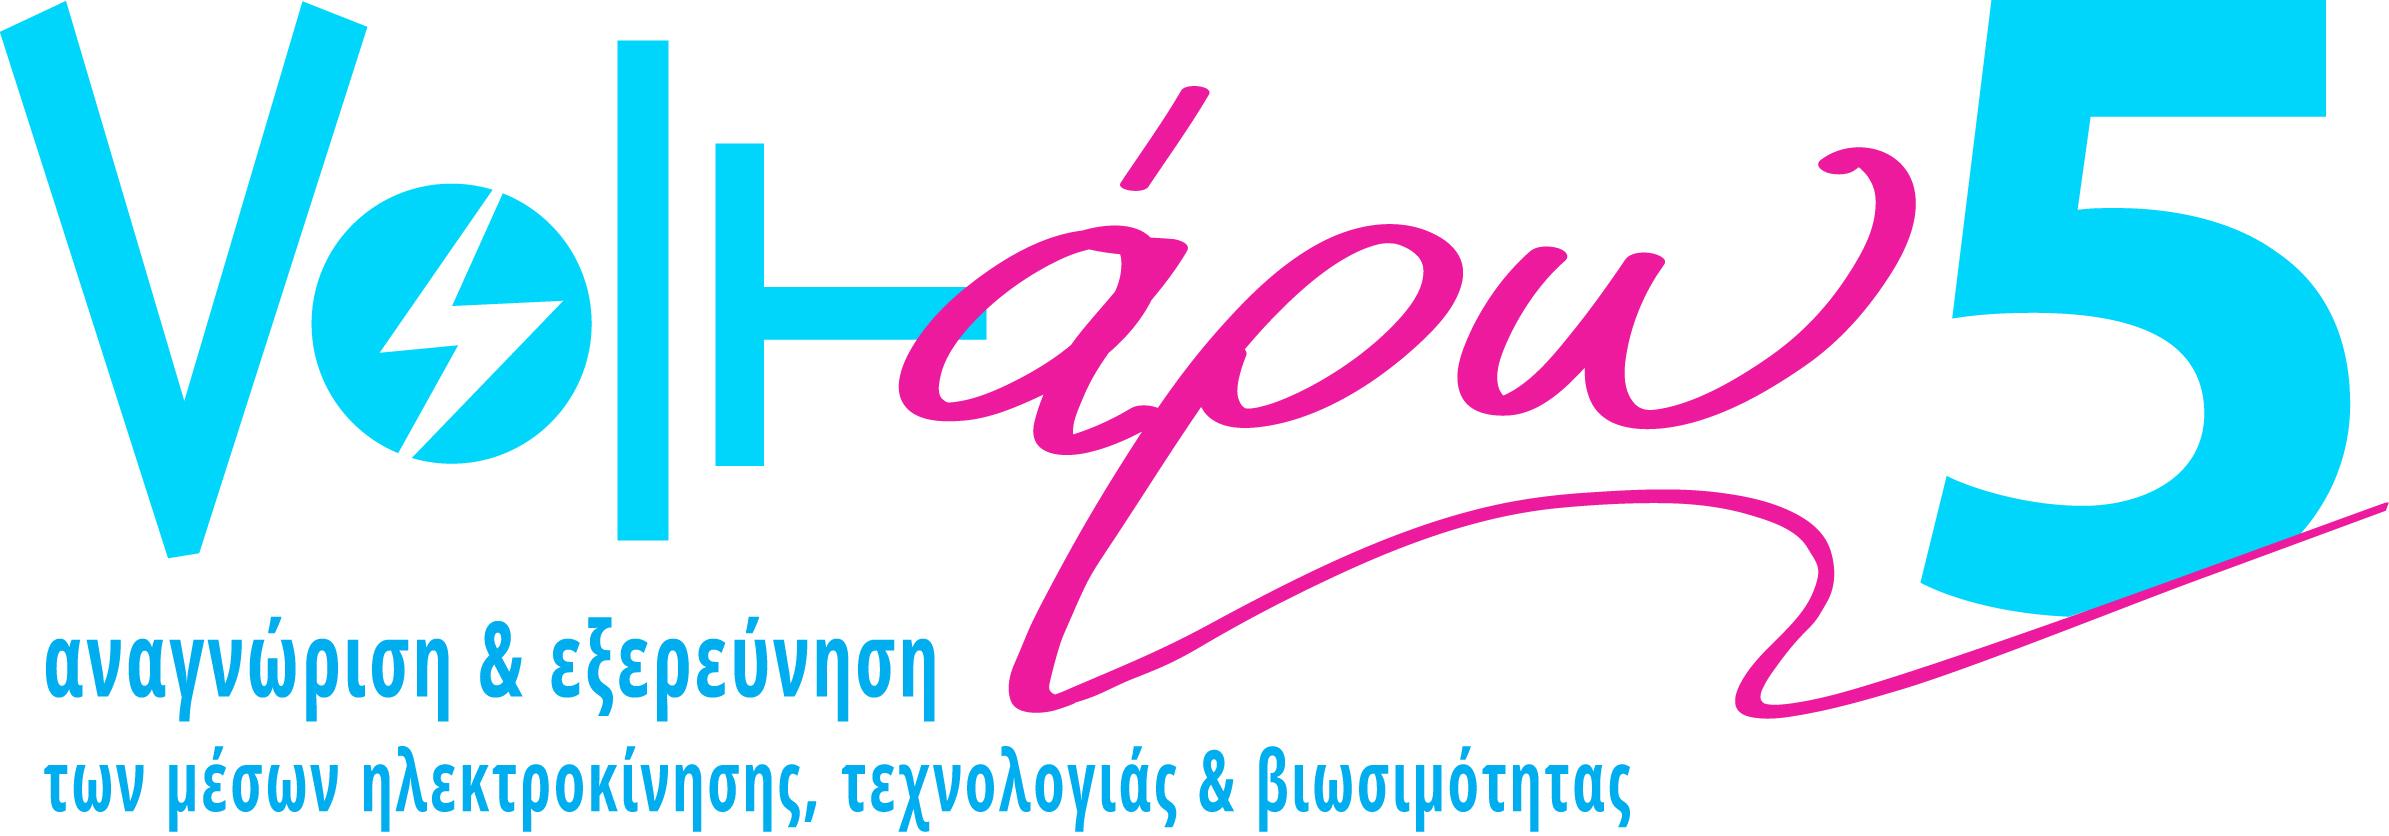 «Voltάρω 5»: Η «πράσινη» γιορτή της  Περιφέρειας Κεντρικής Μακεδονίας  για την ηλεκτροκίνηση  στην παραλία της Θεσσαλονίκης